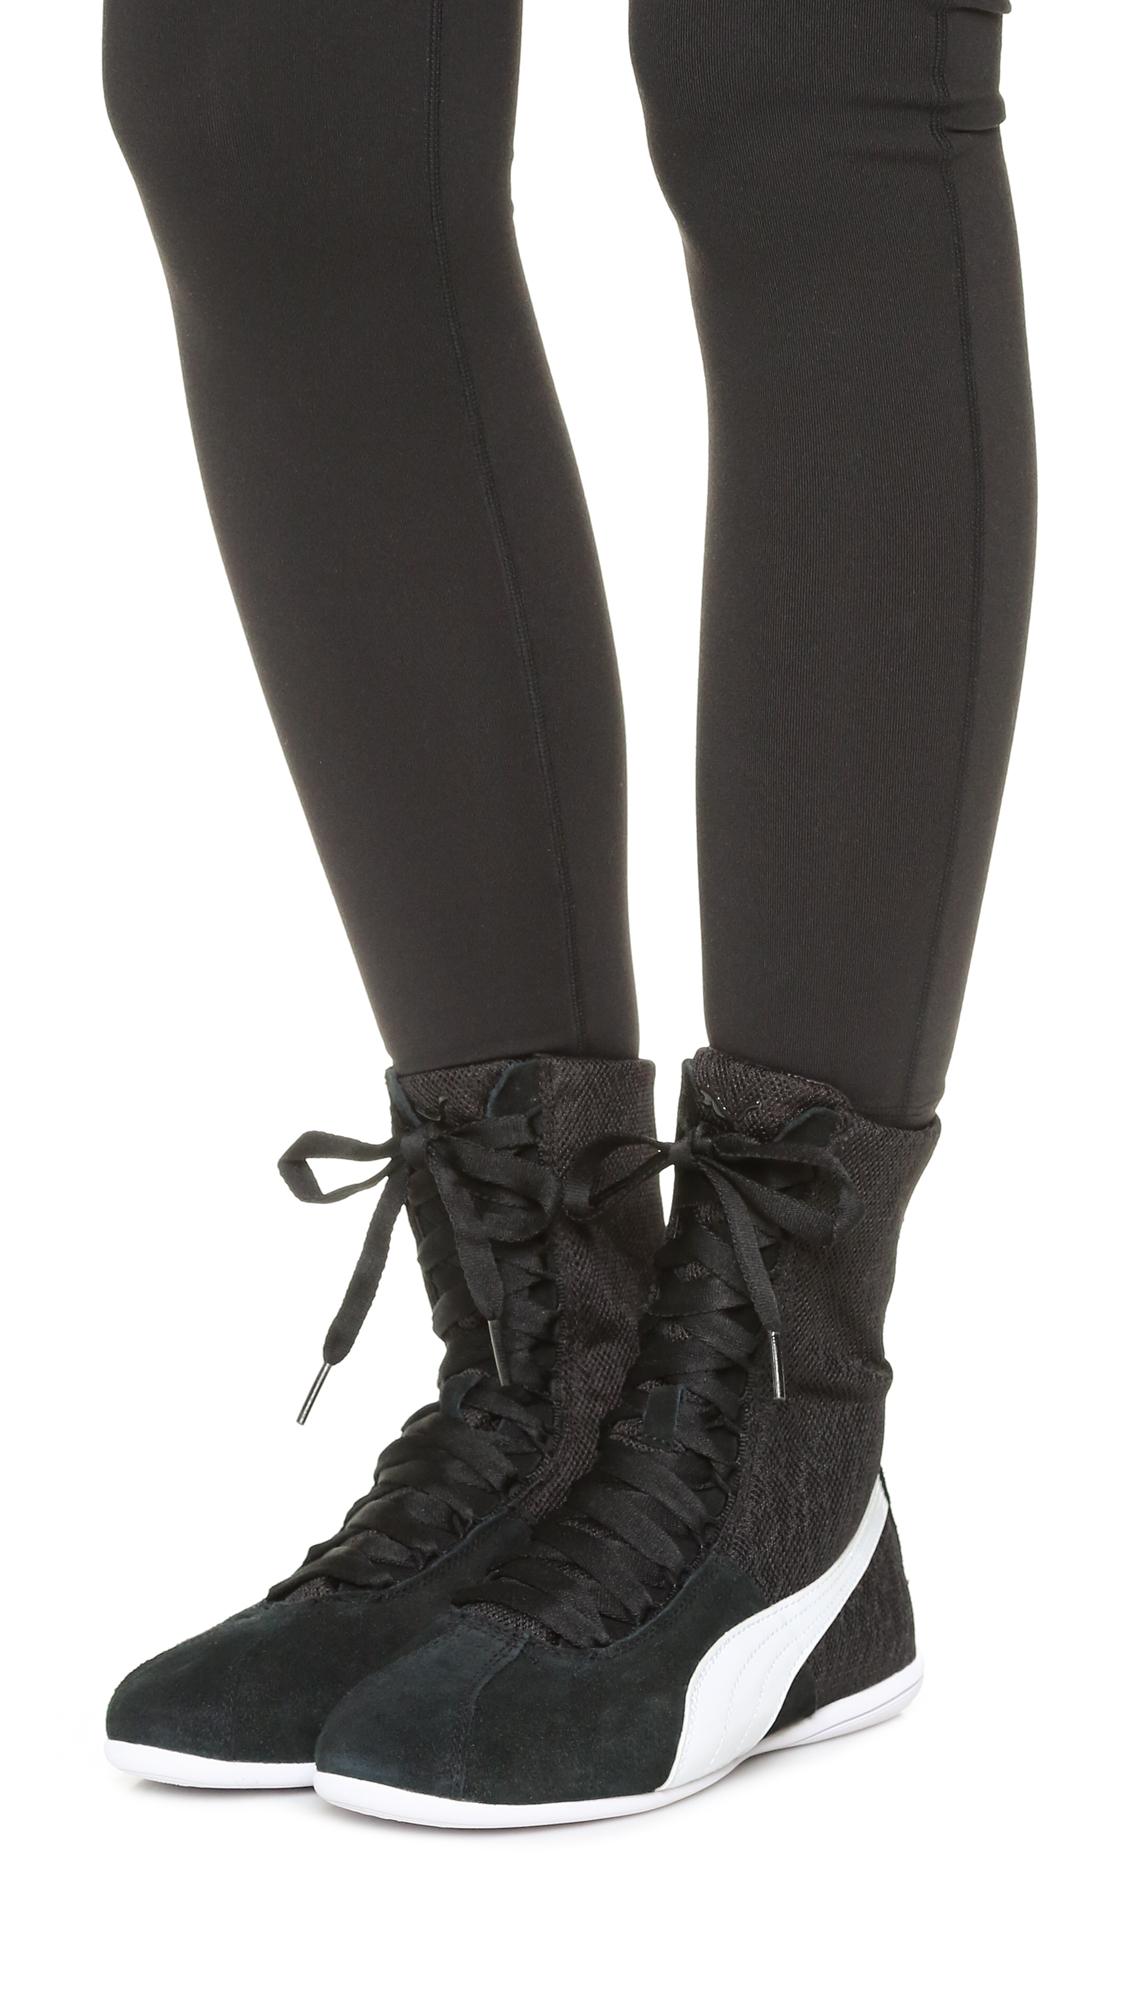 5baac7c555e5c PUMA Black Eskiva High Top Textured Sneakers